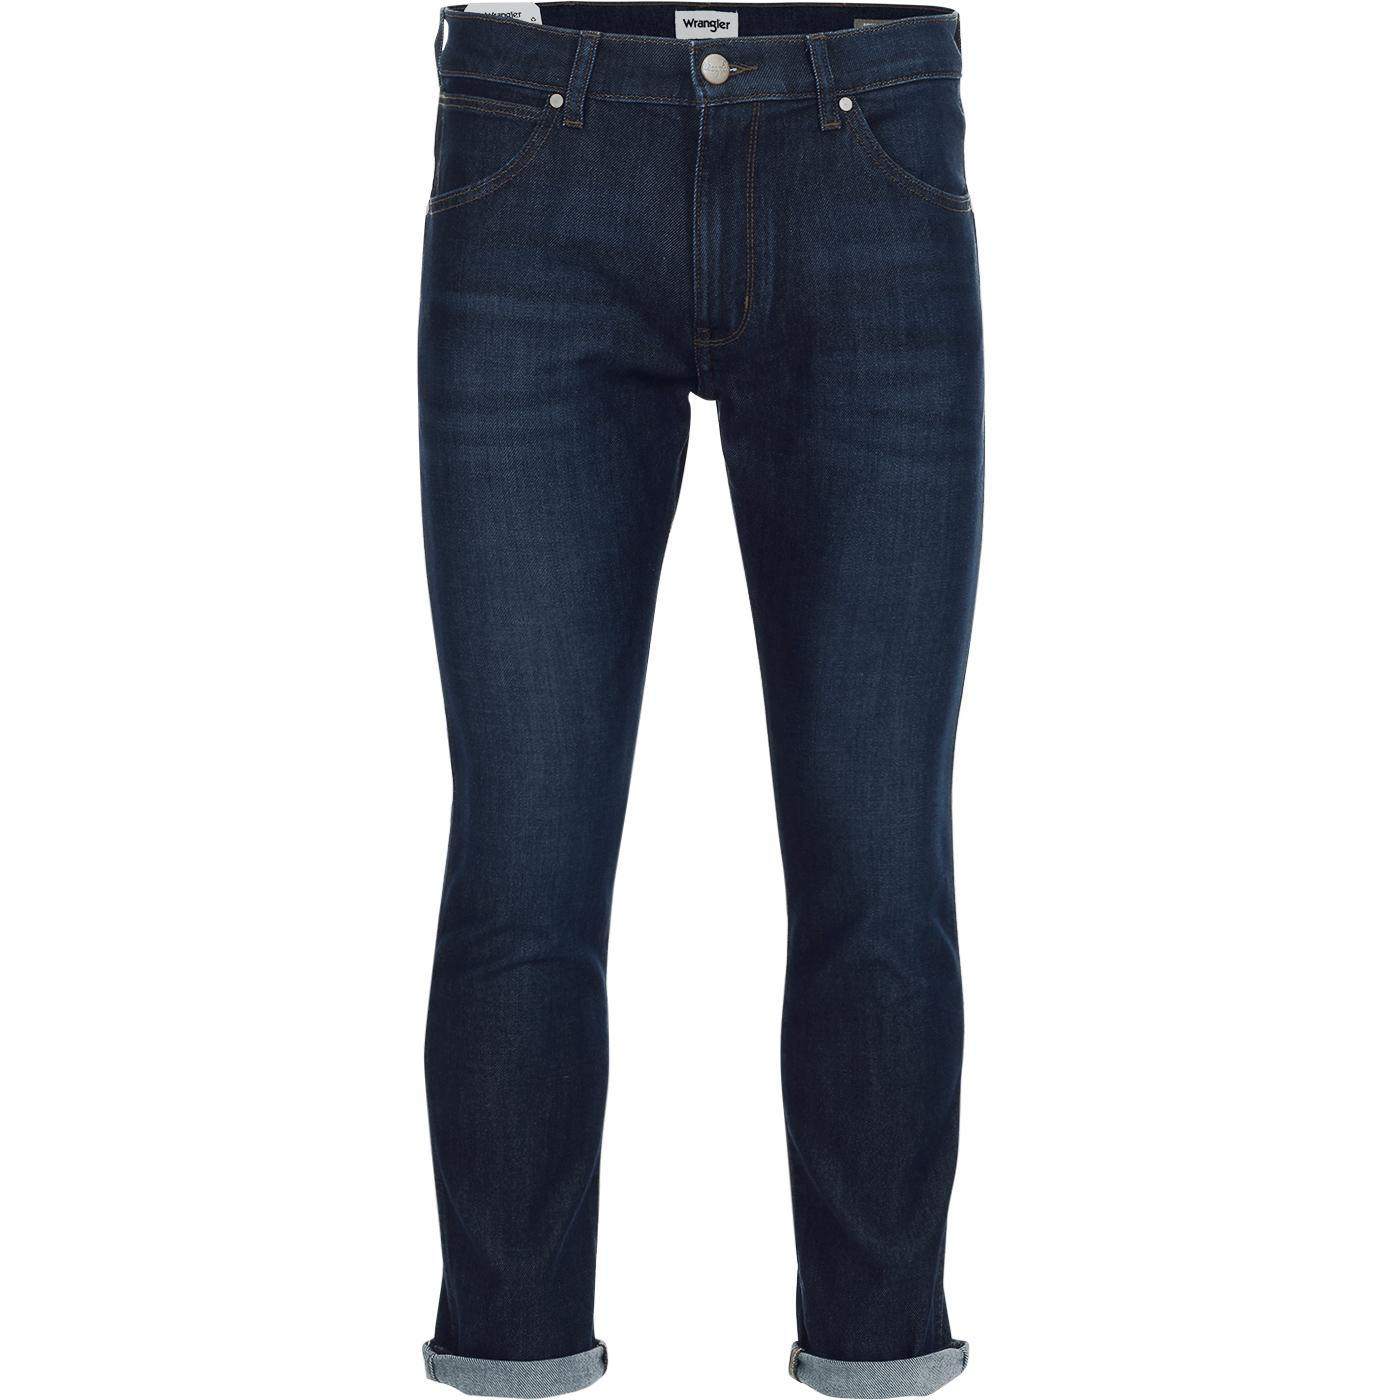 Larston WRANGLER Sphere Blue Slim Taper Jeans